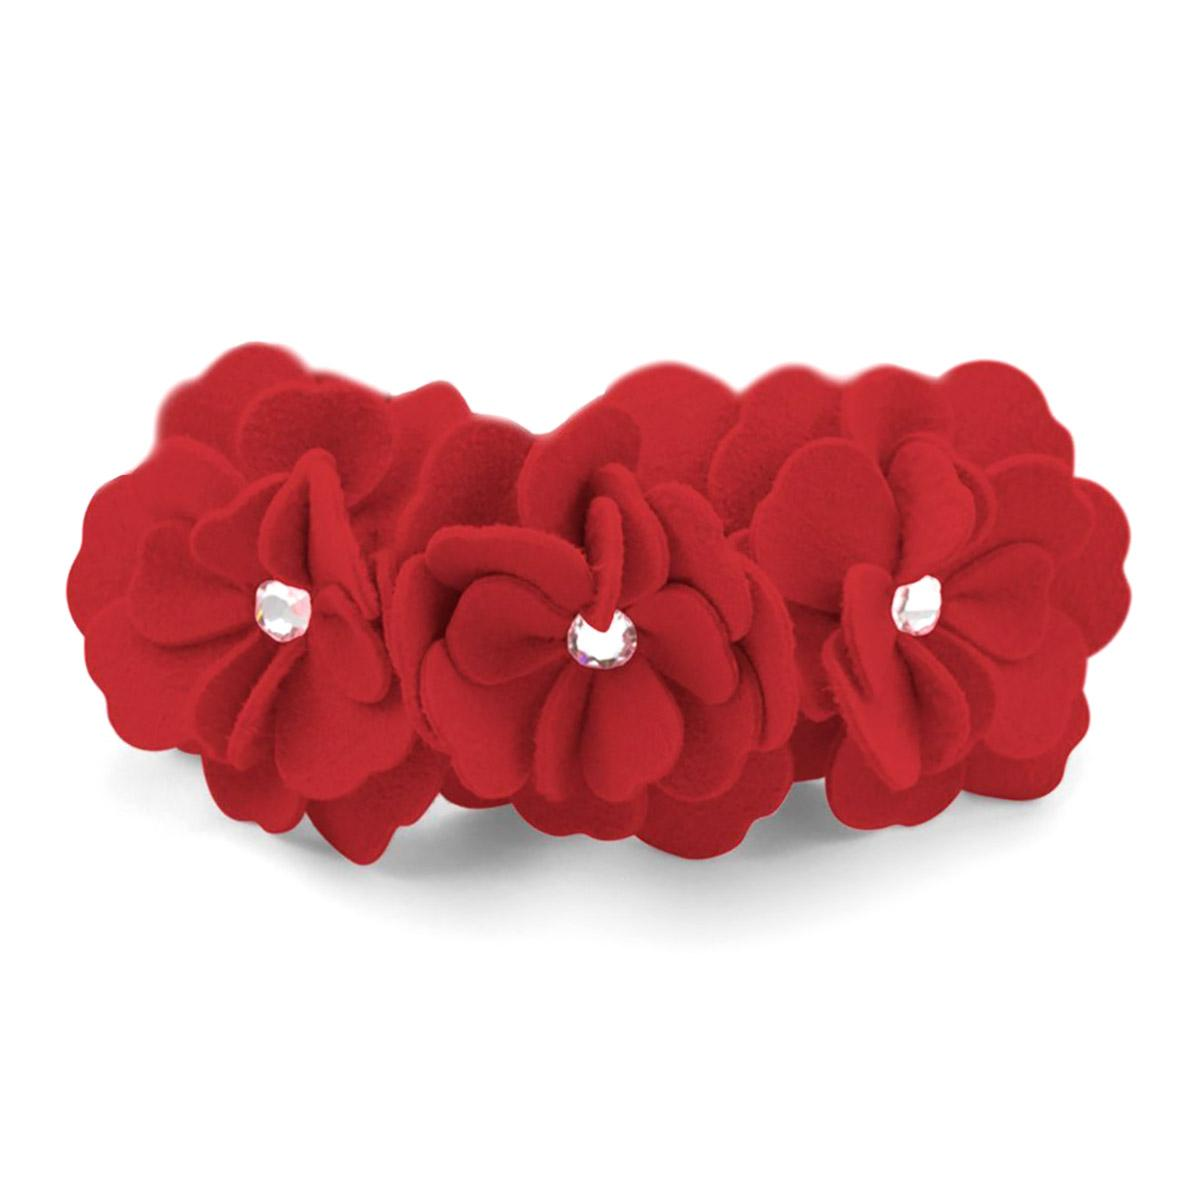 Tinkie's Garden Dog Collar by Susan Lanci - Red